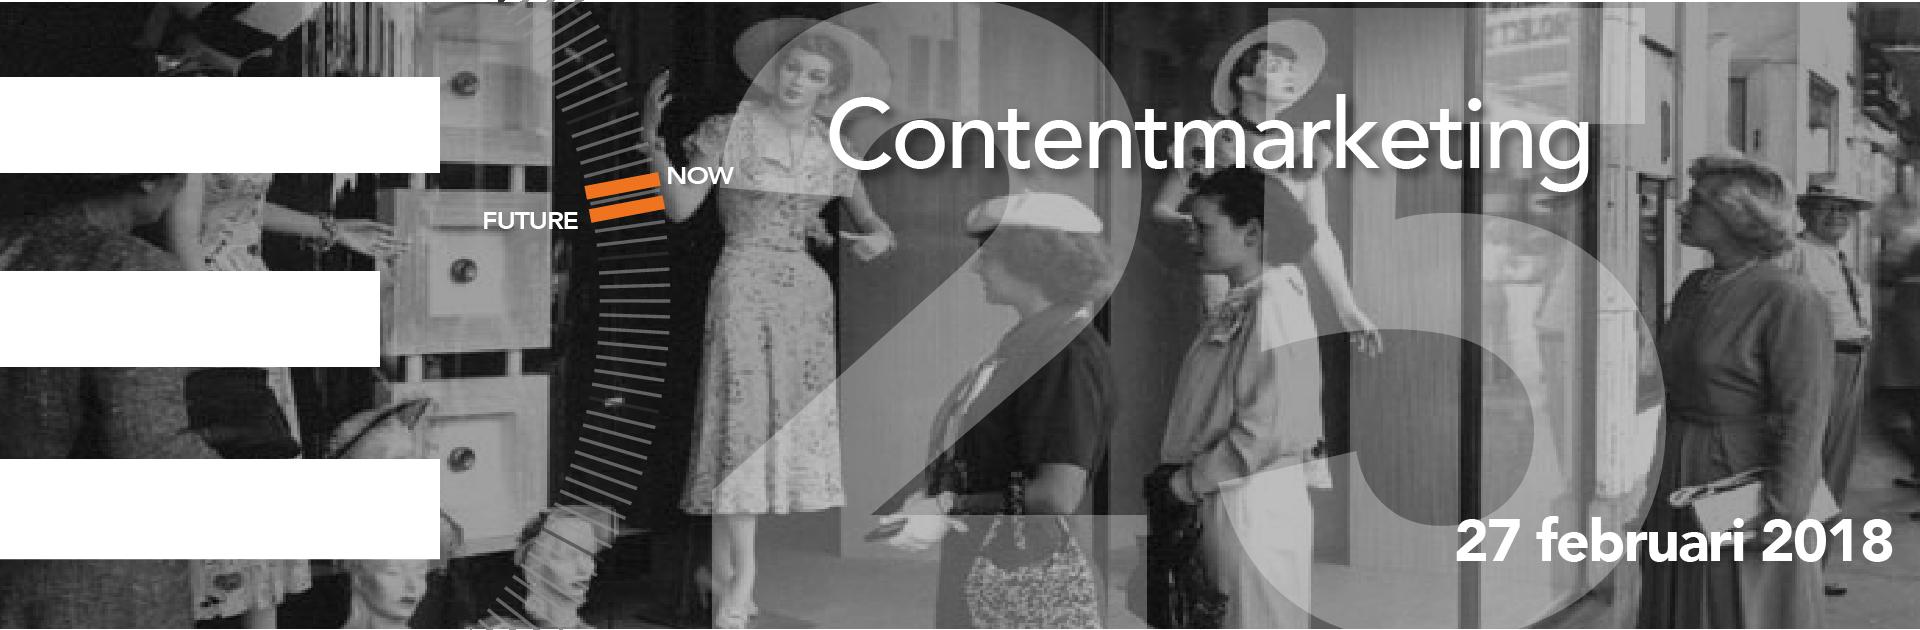 banner_contentmarketing